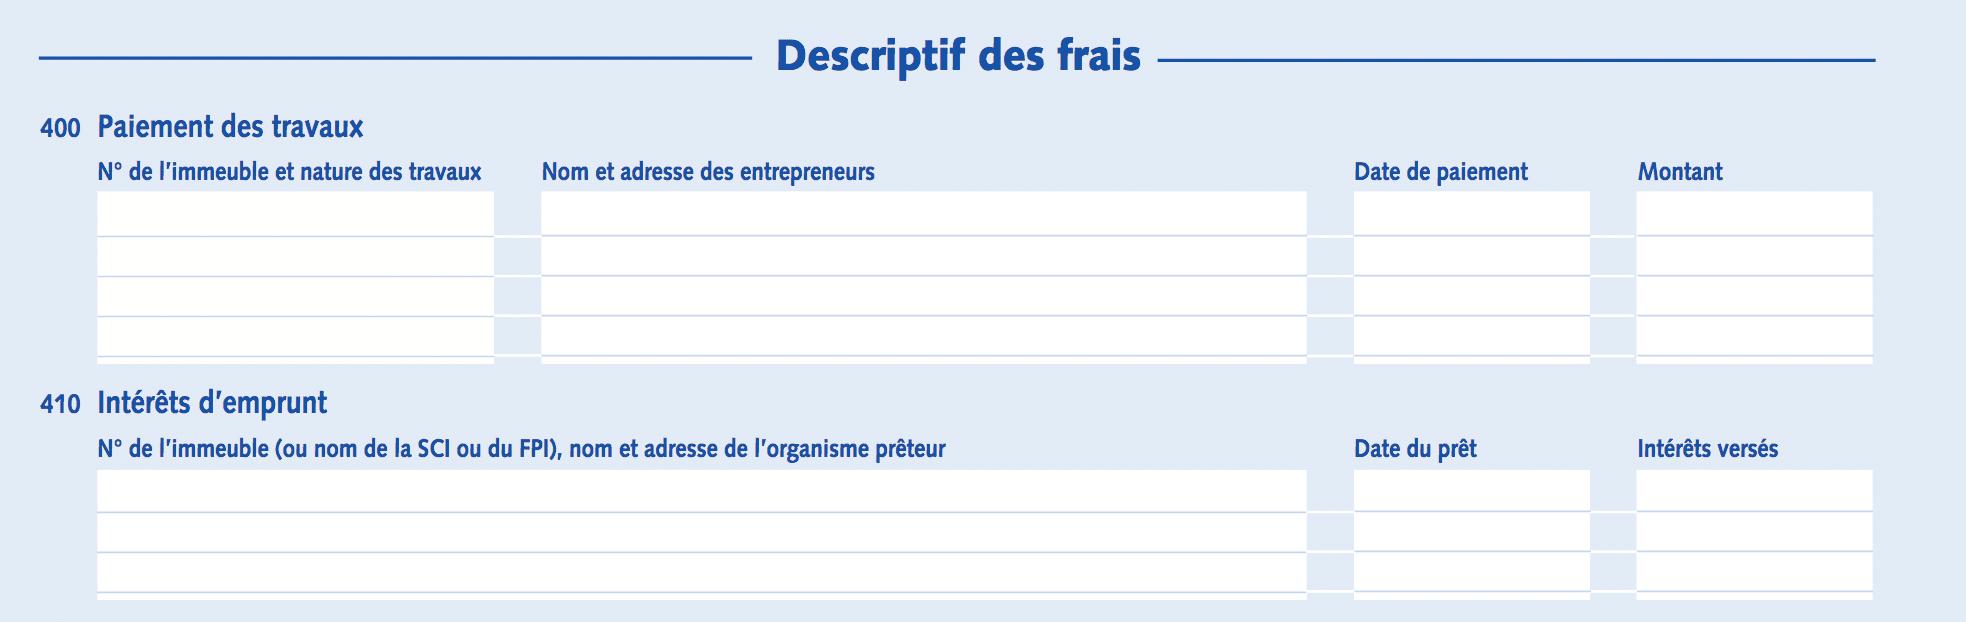 descriptif-frais-2044-deficit-foncier